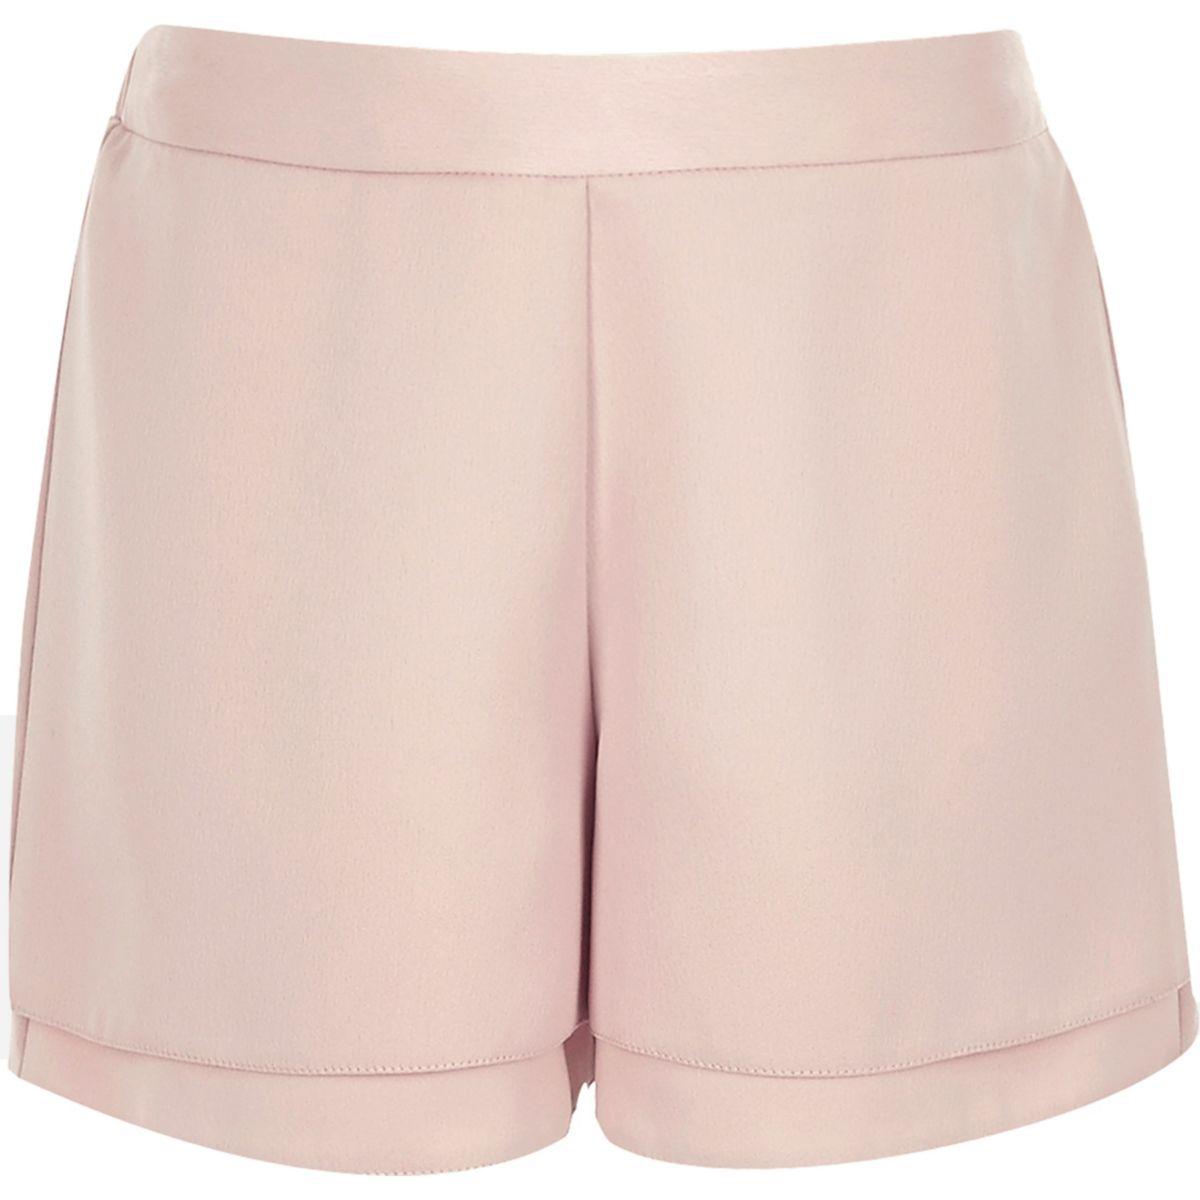 Girls pink high waisted shorts